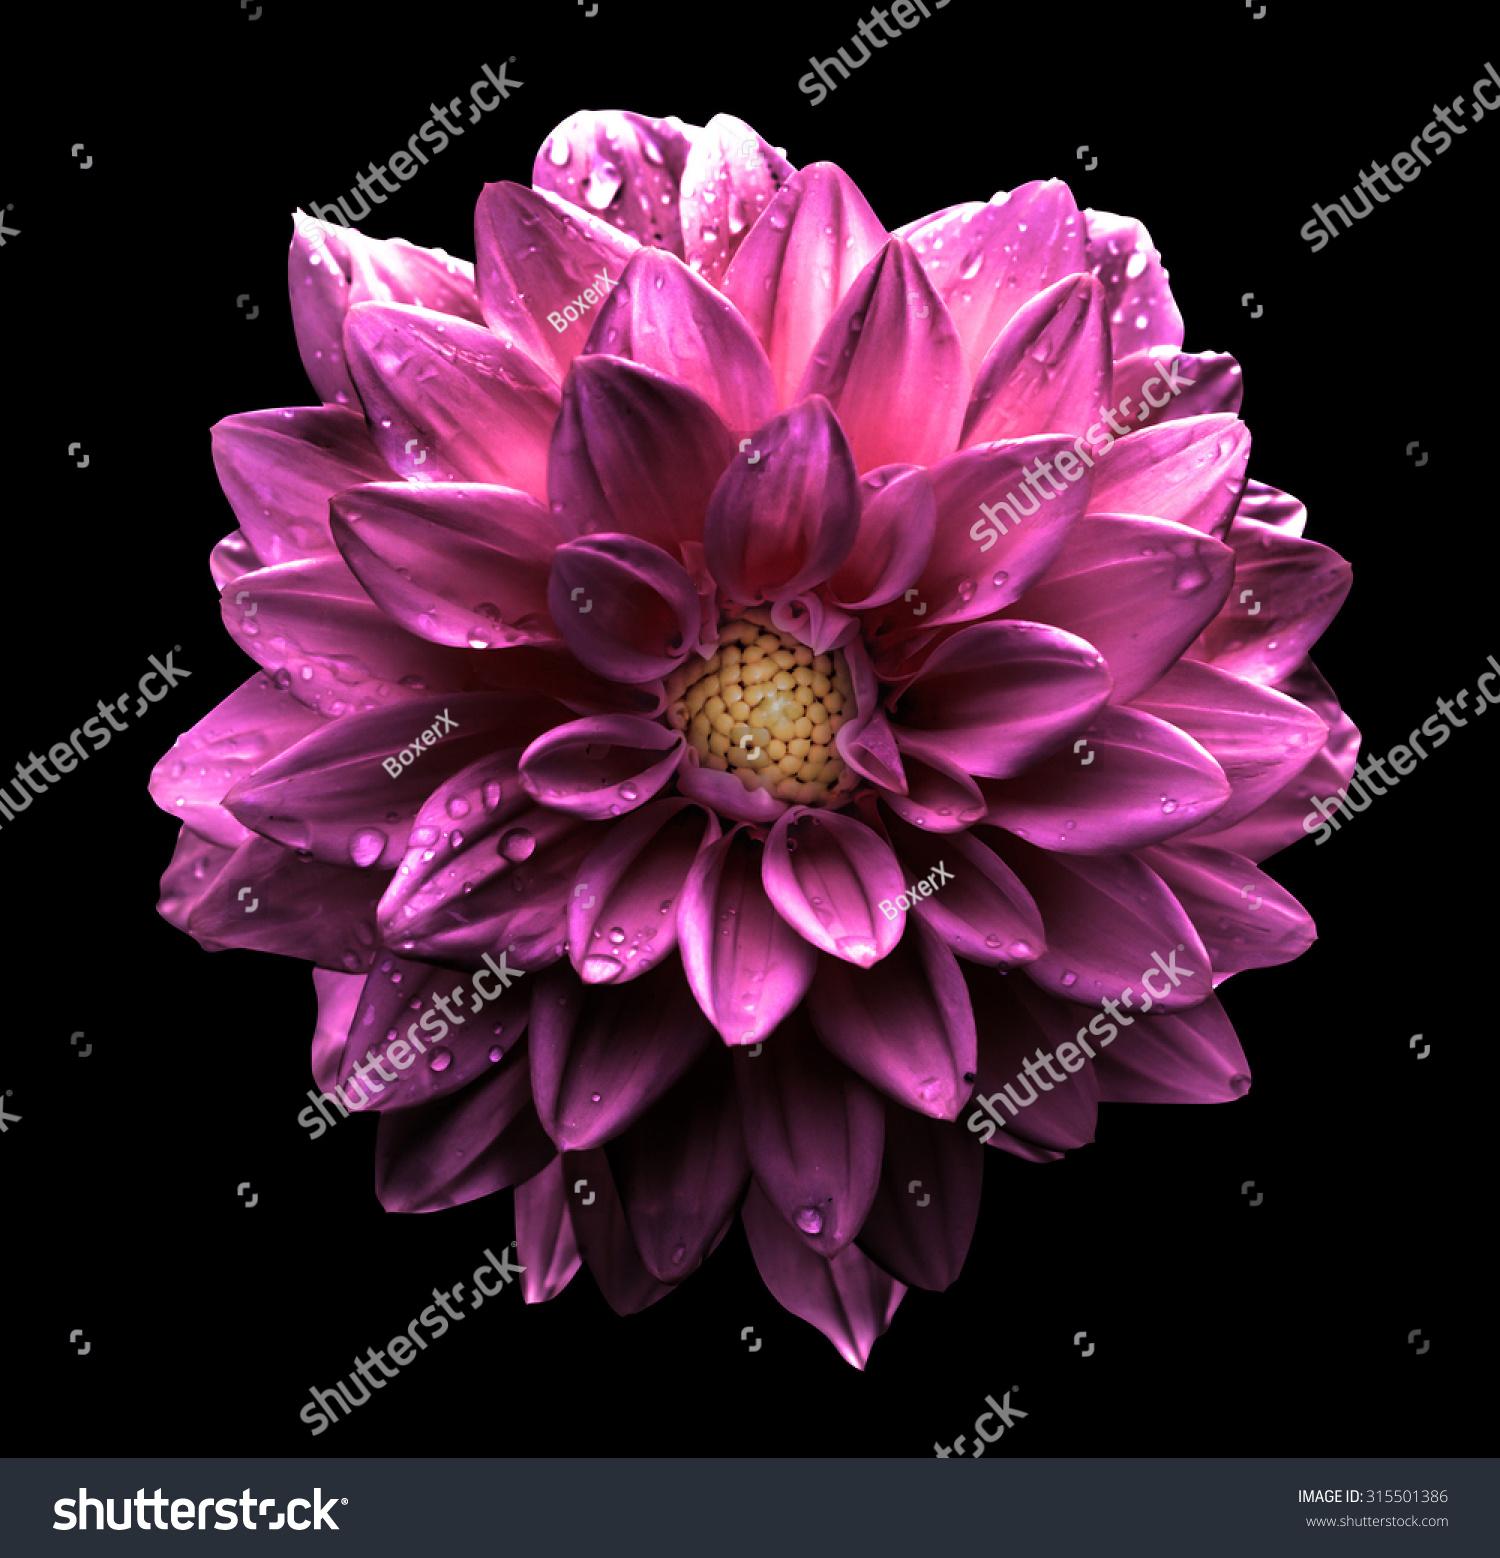 Surreal dark chrome pink flower dahlia stock photo royalty free surreal dark chrome pink flower dahlia stock photo royalty free 315501386 shutterstock izmirmasajfo